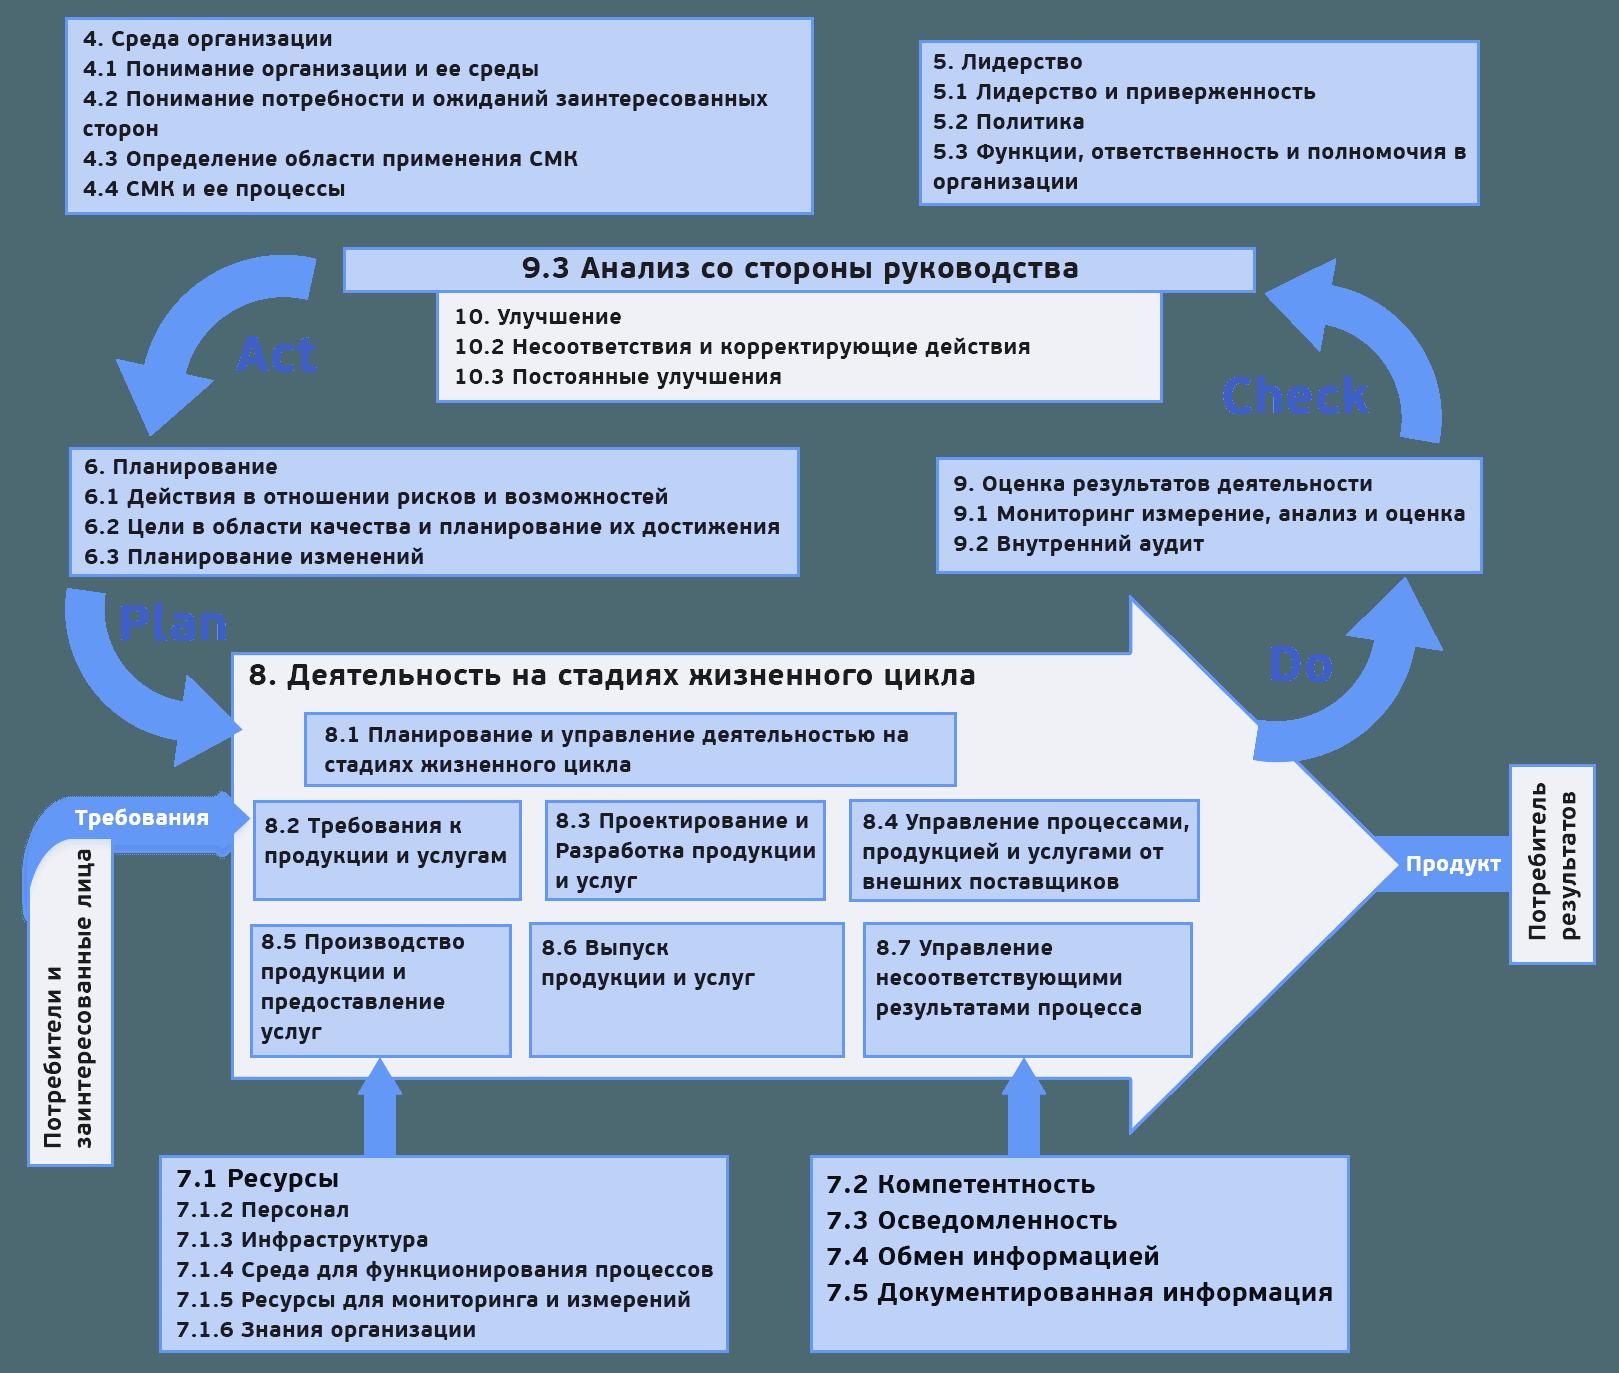 9001 draft 2015 pdf iso